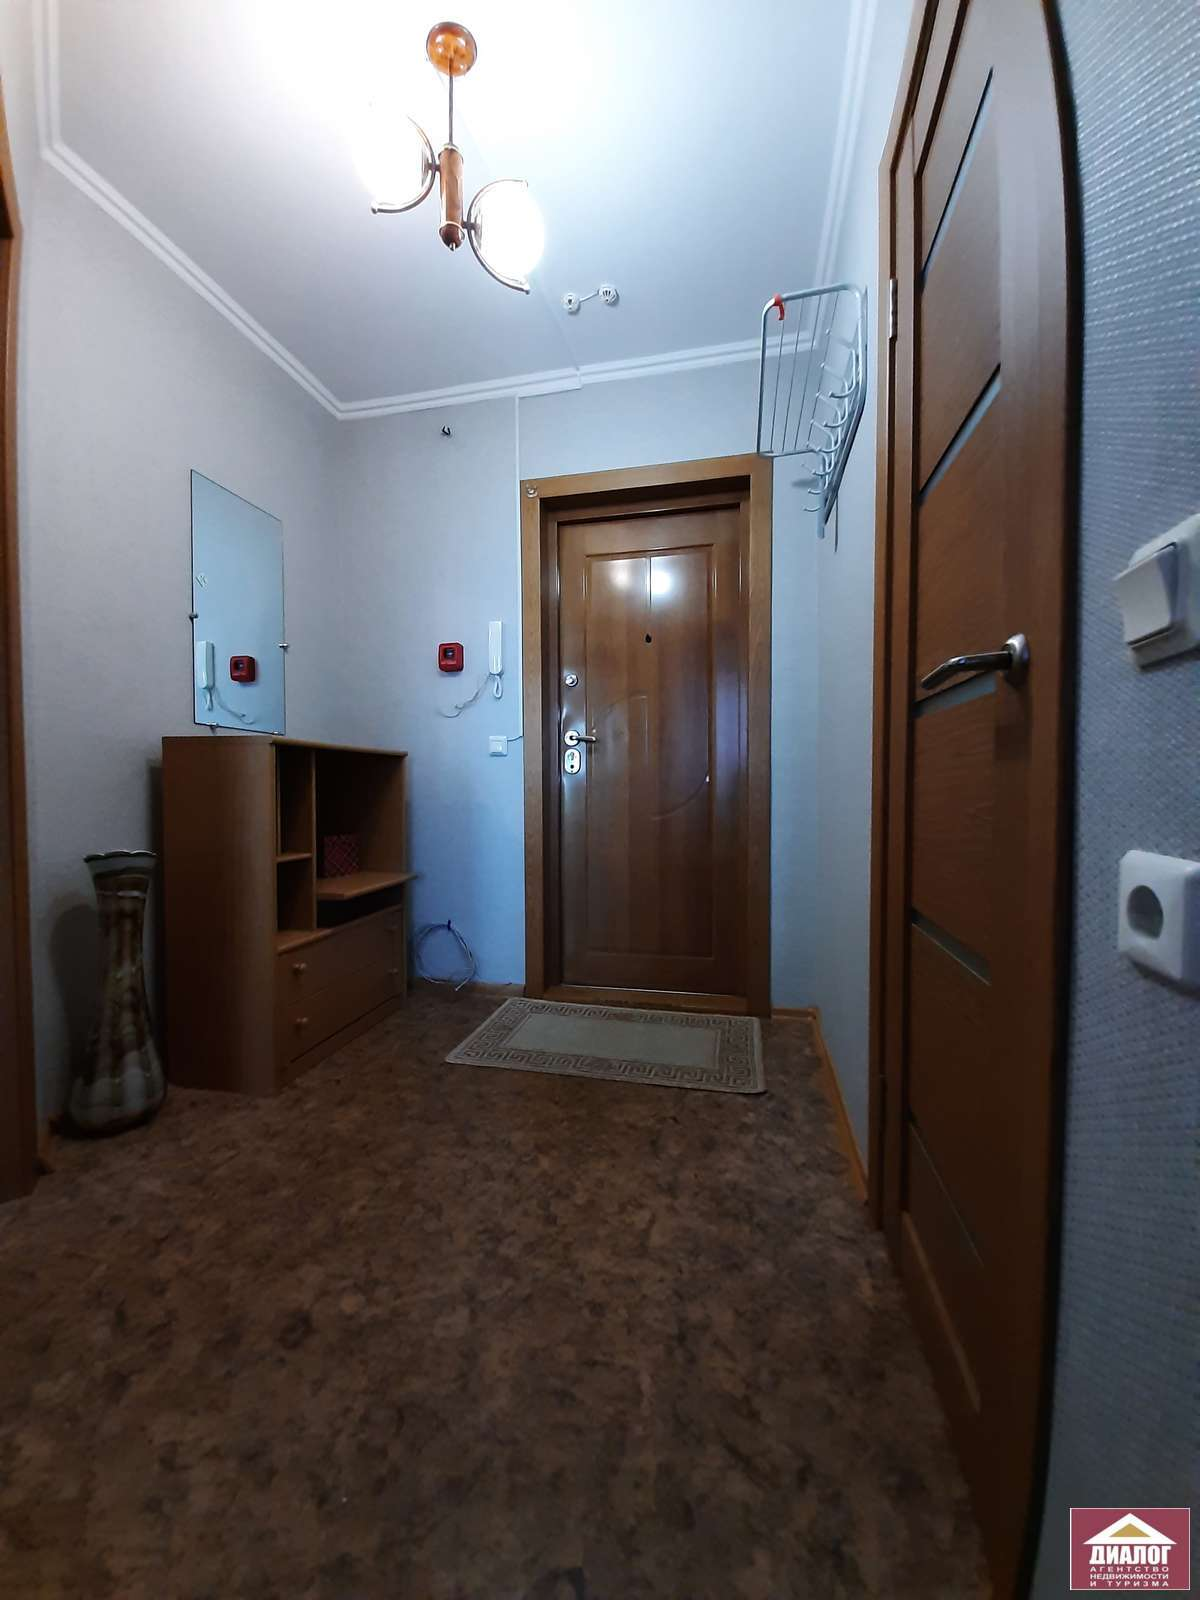 Аренда 1-комнатной квартиры, г. Тольятти, 40 лет Победы улица  дом 11 А